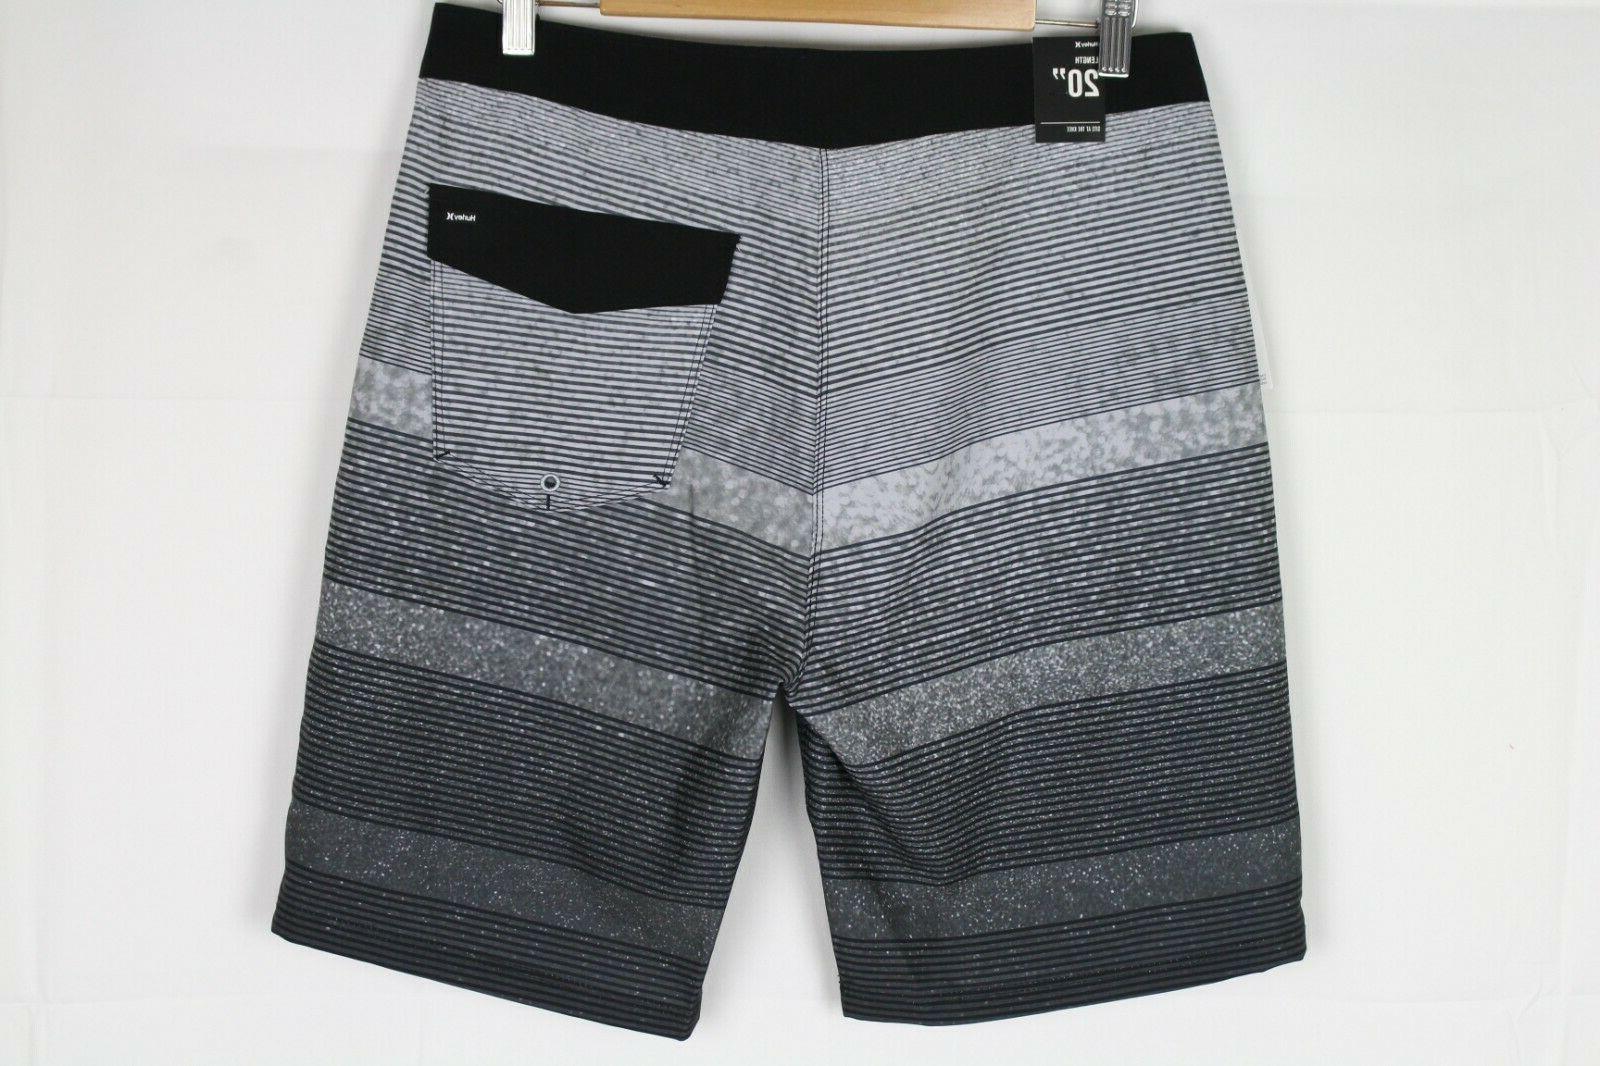 Hurley Men's Gray Striped MBS0009020